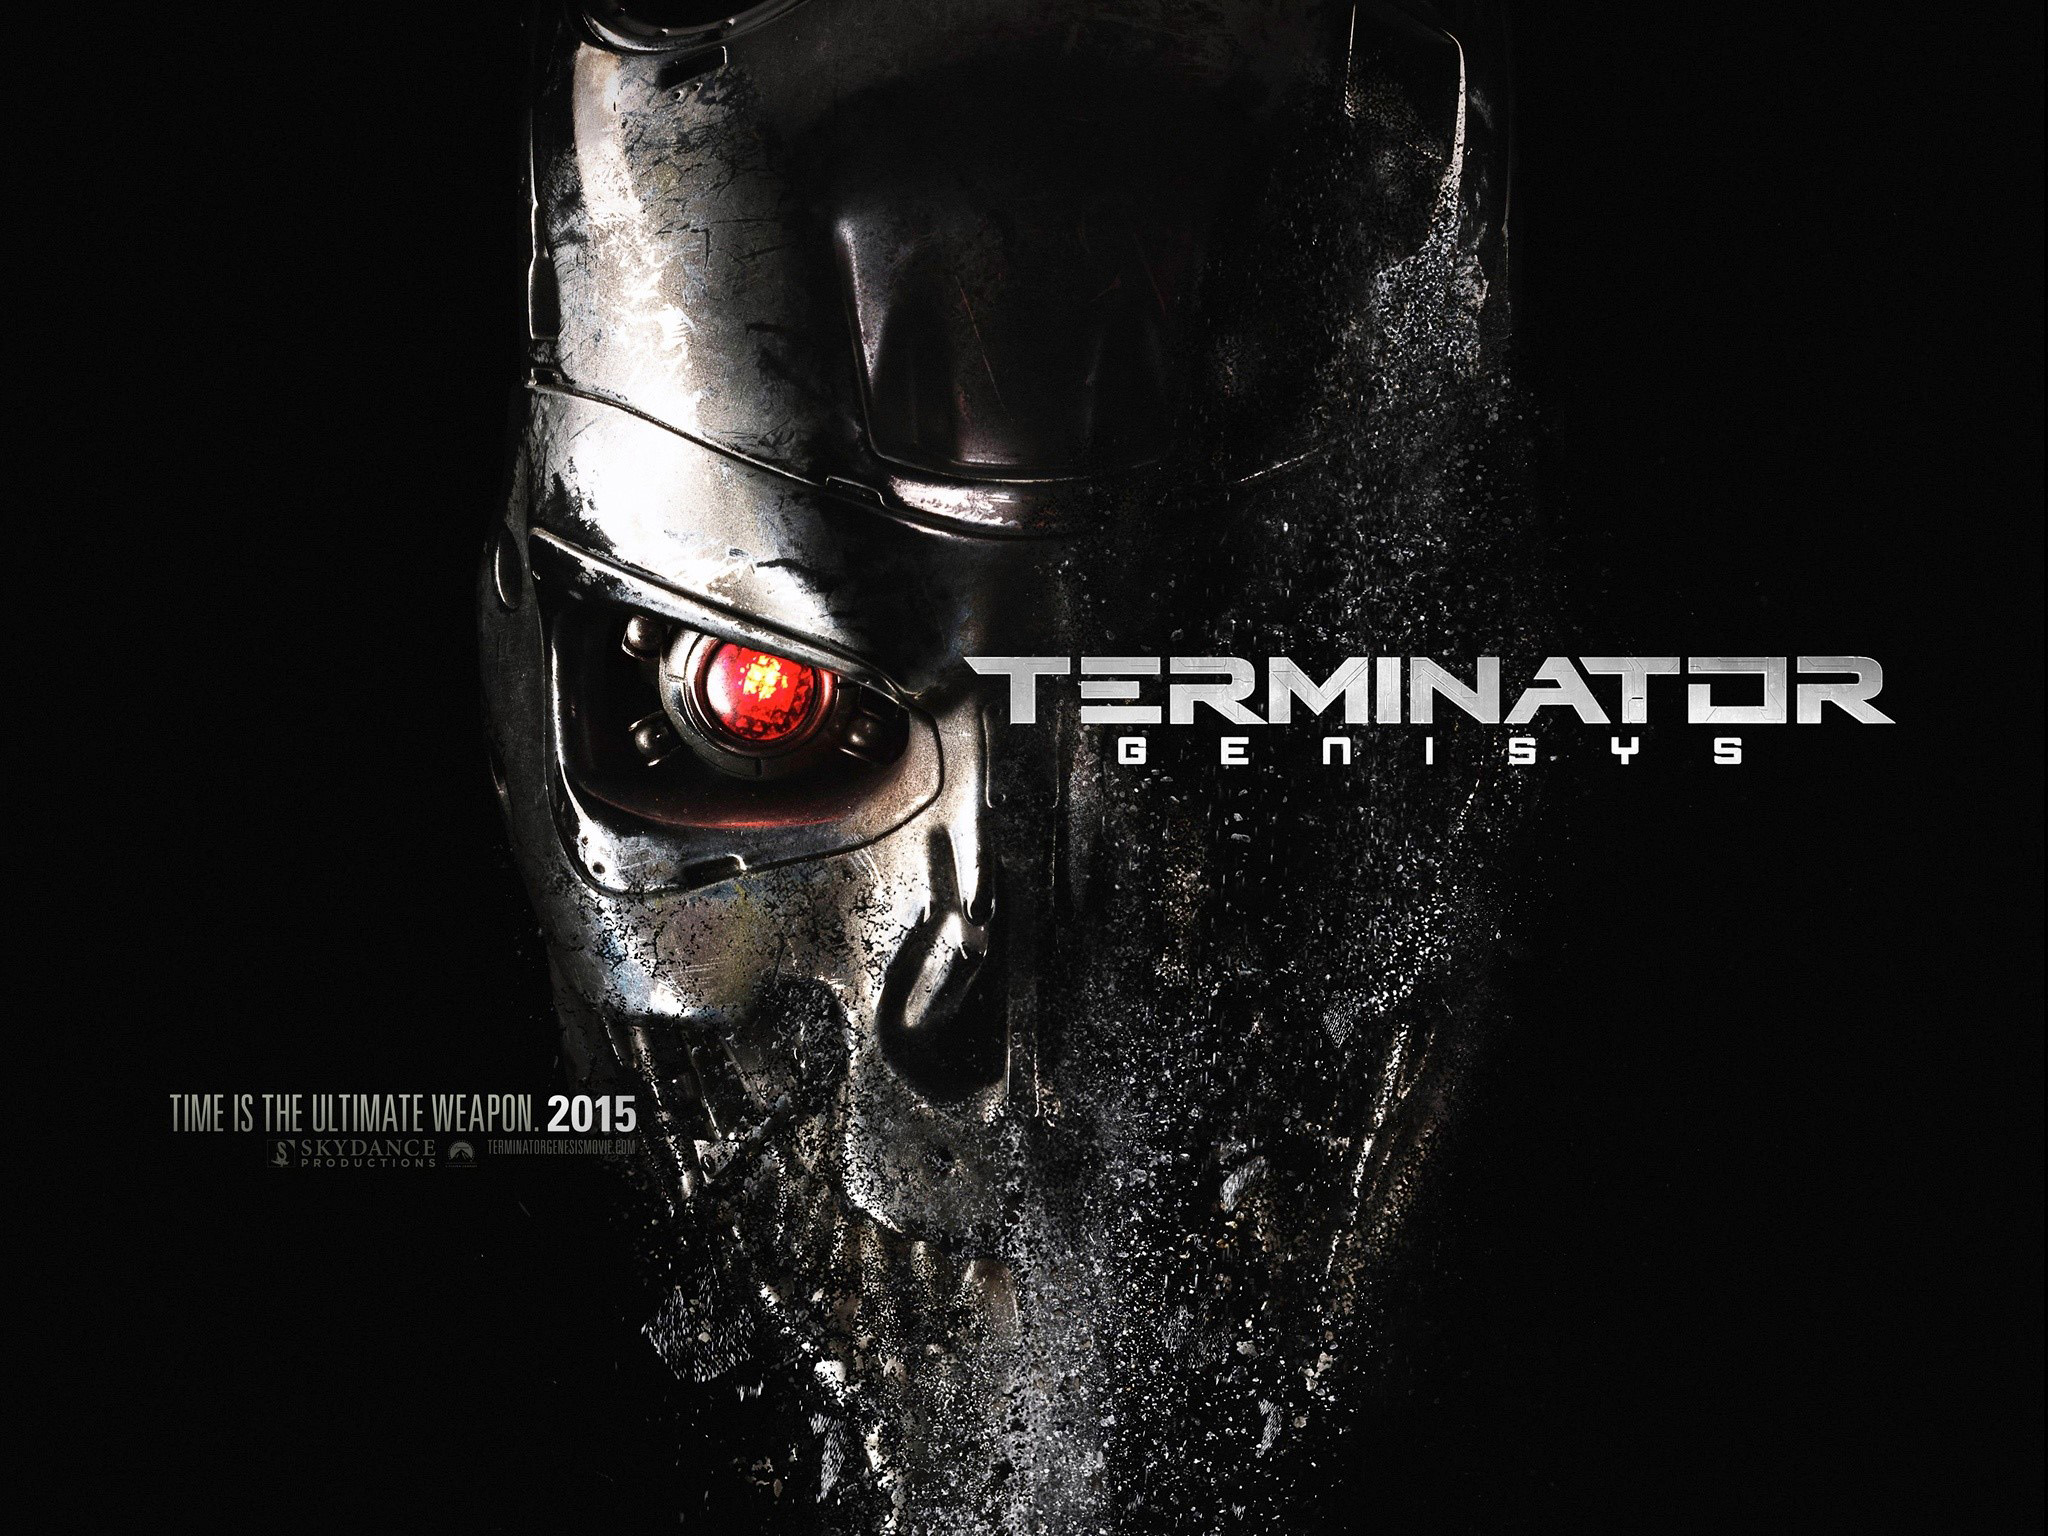 Wallpaper Terminator Genisys